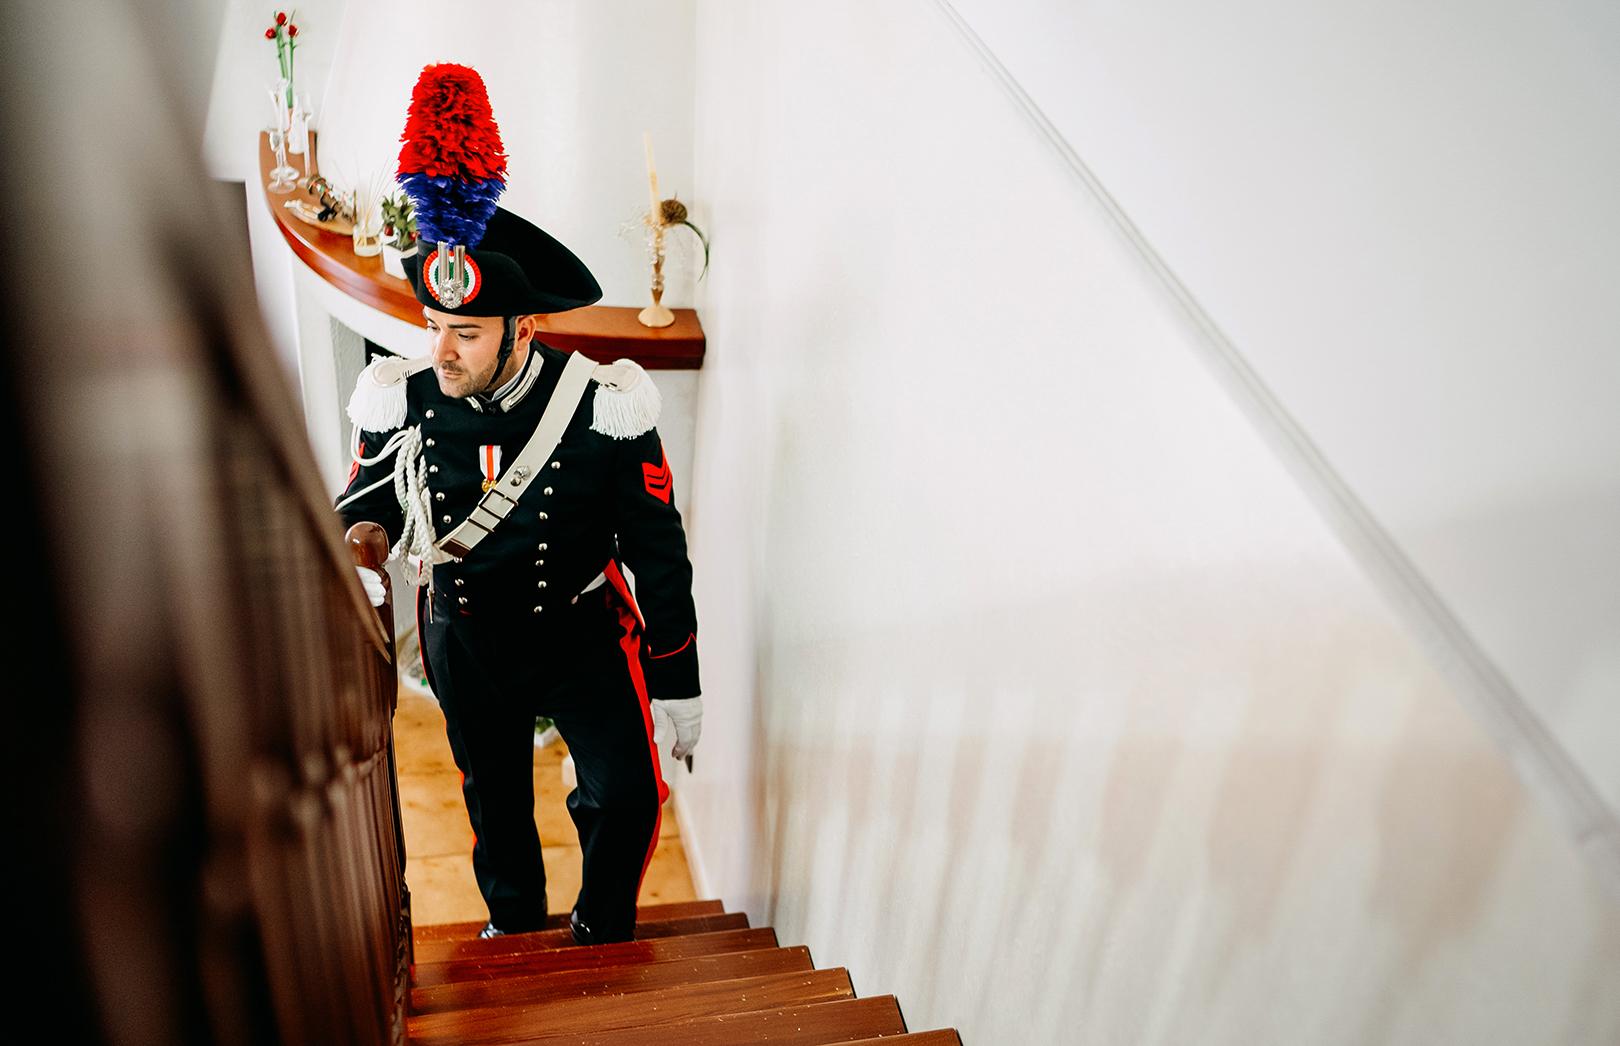 9 gianni-lepore-sposo-divisa-carabiniere